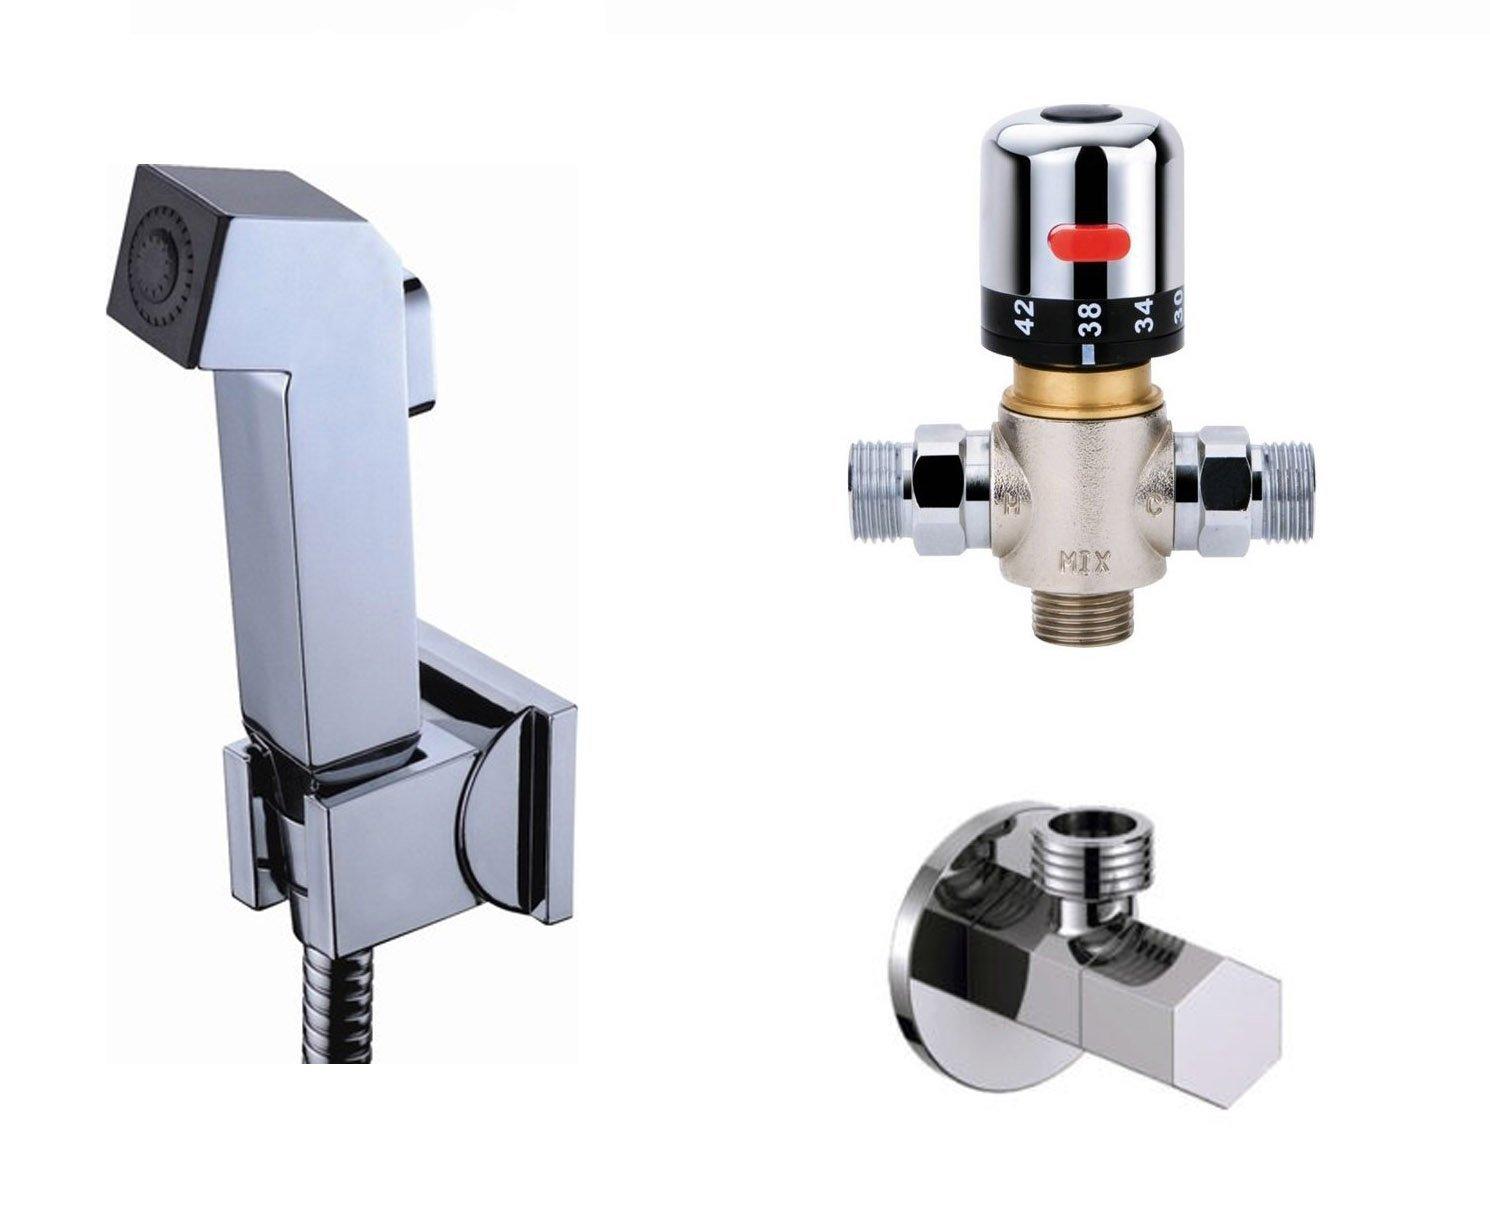 Ownace Bath G1/2 Thermostatic Mixer Valve Toilet Square Handheld Bidet Sprayer Shower Head Douche kit Set